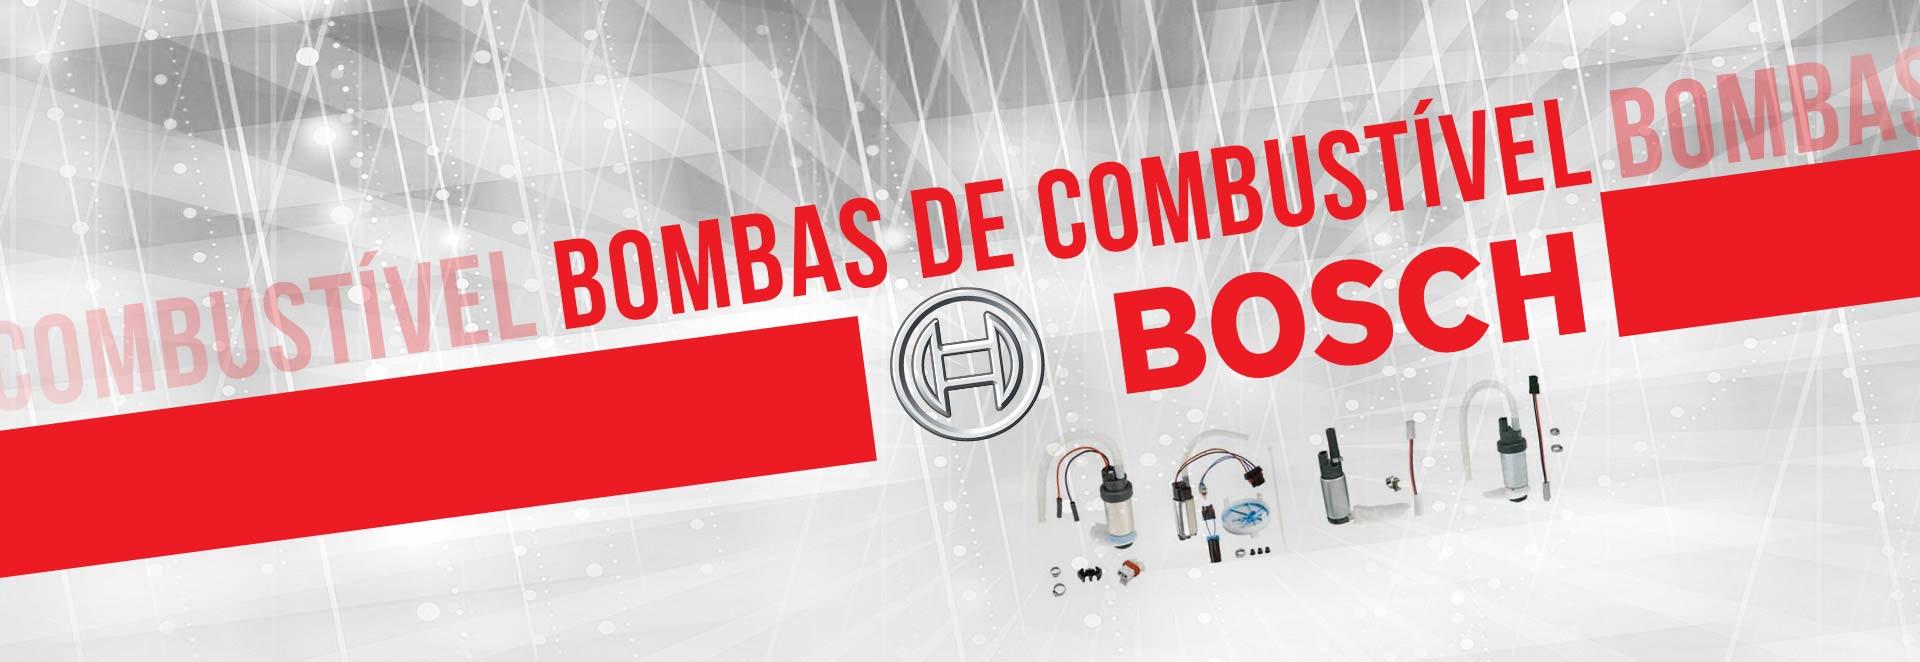 Bombas Bosch